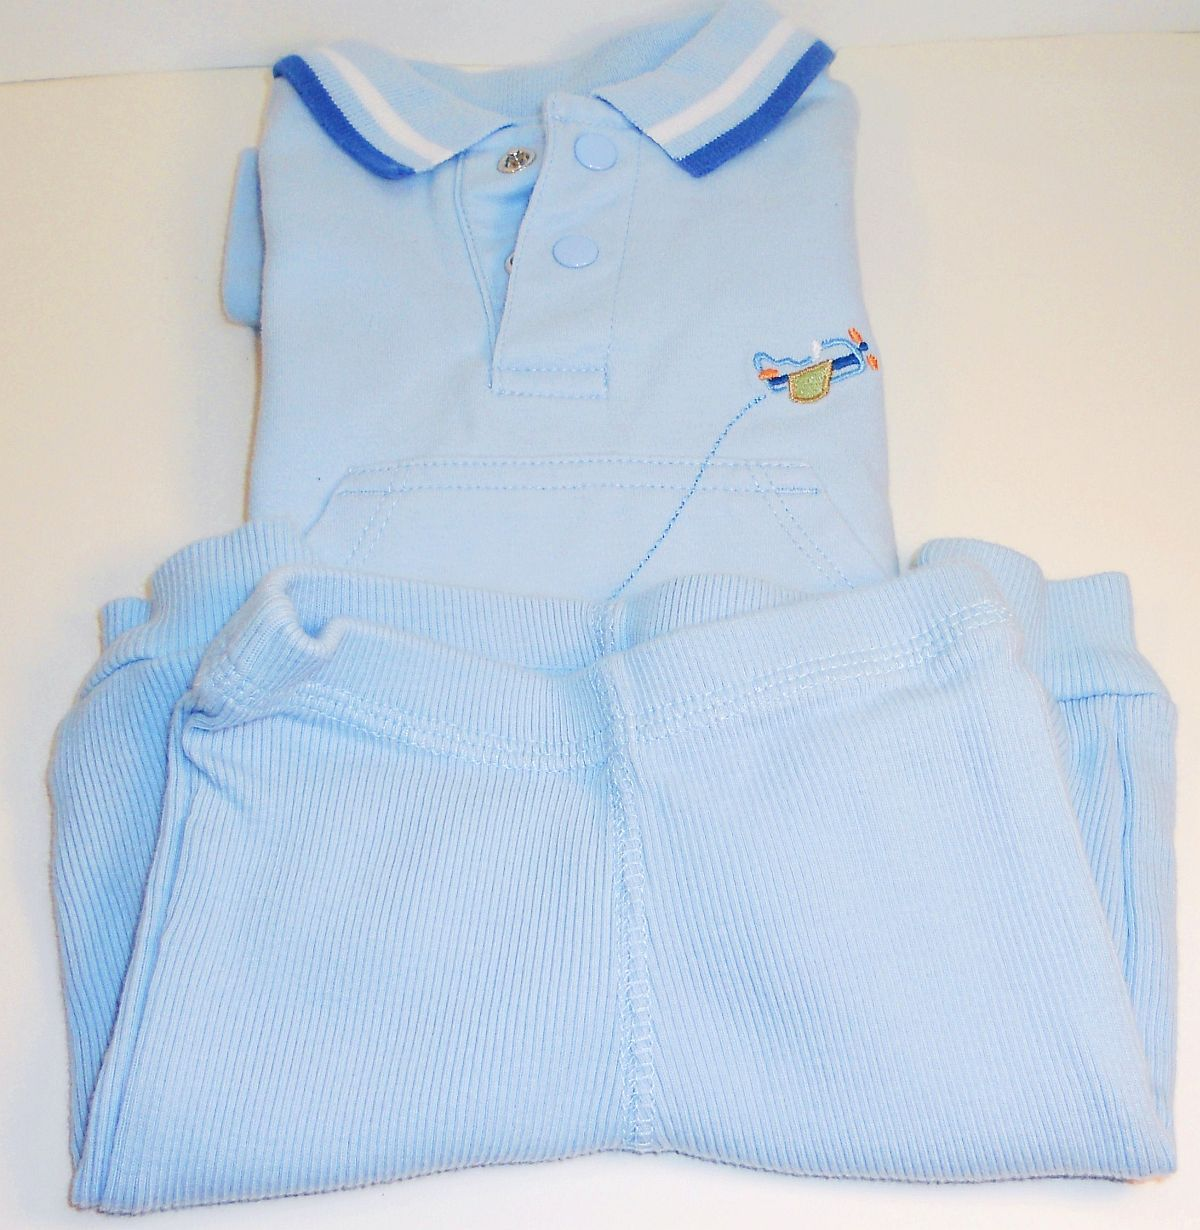 Image 1 of Carter's Child of Mine blue boys shirt pant sweatsuit New Born